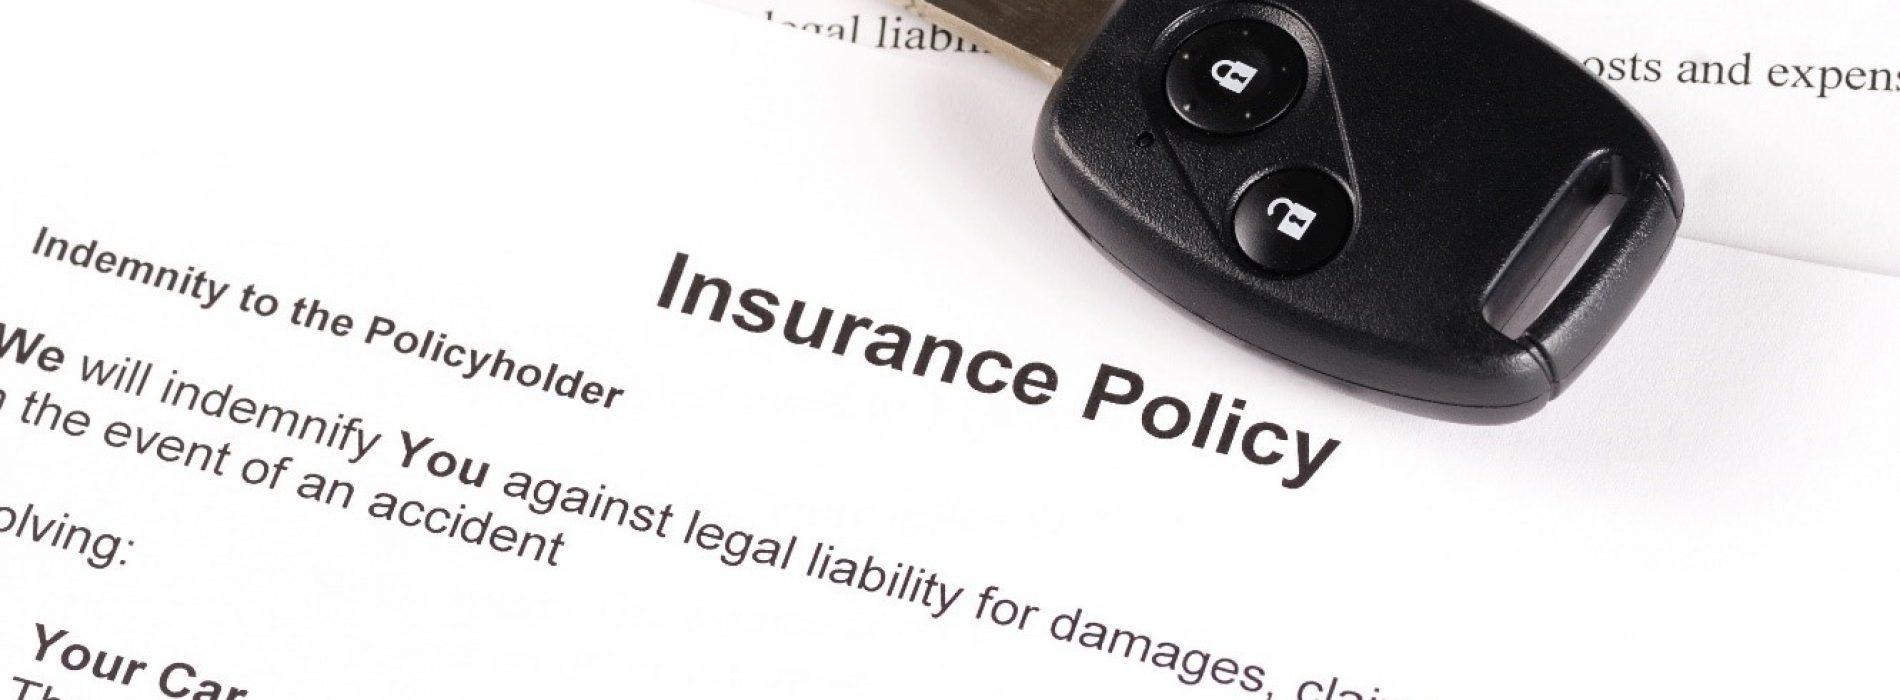 Understanding The Claim Process For Bonds Vs. Insurance